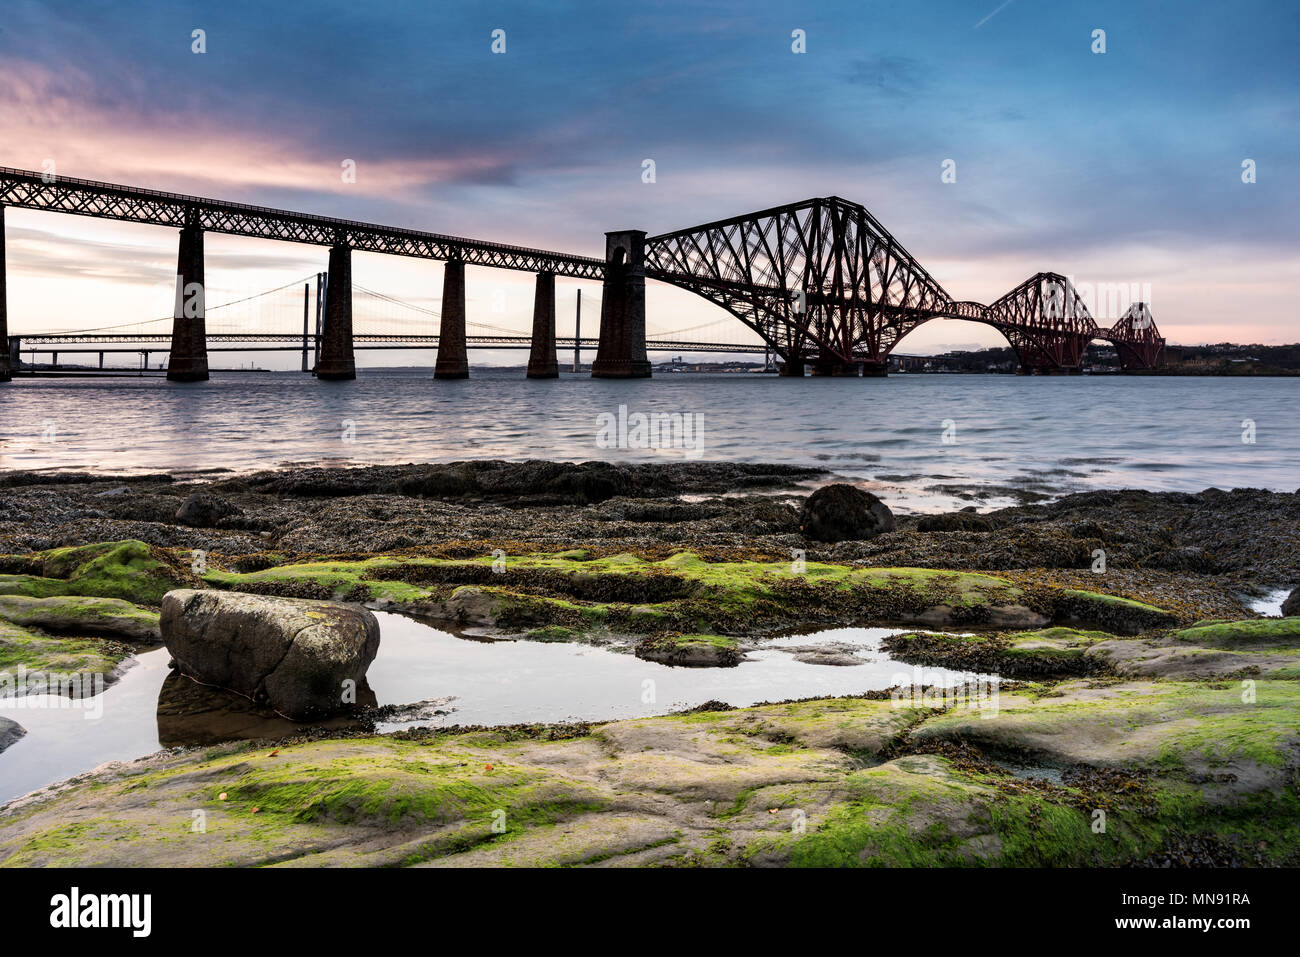 An old historic rail bridge in Queensferry near Edinburgh in Scotland before sunset - Stock Image